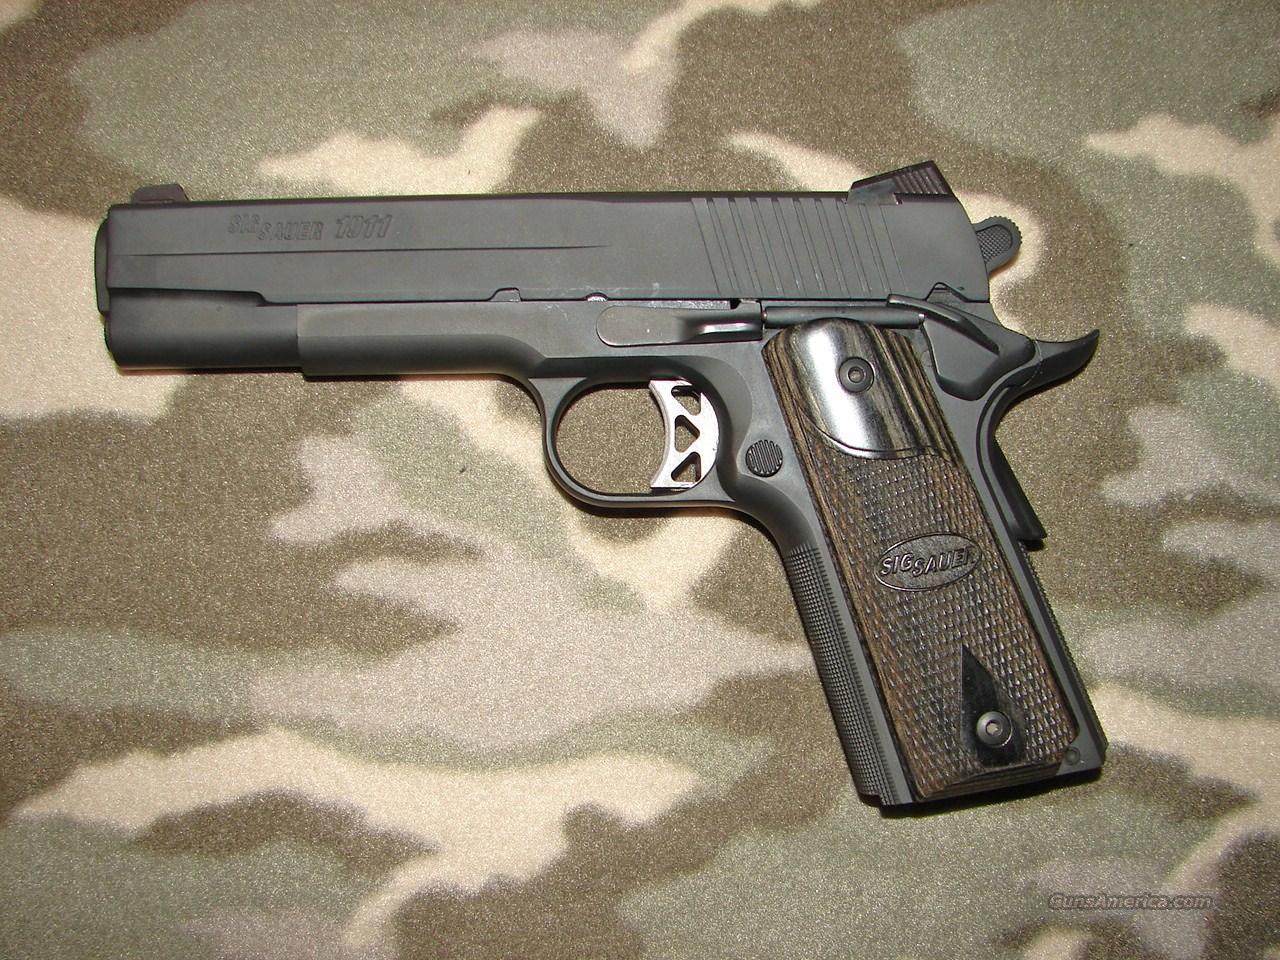 Sig Sauer 1911  Guns > Pistols > Sig - Sauer/Sigarms Pistols > 1911